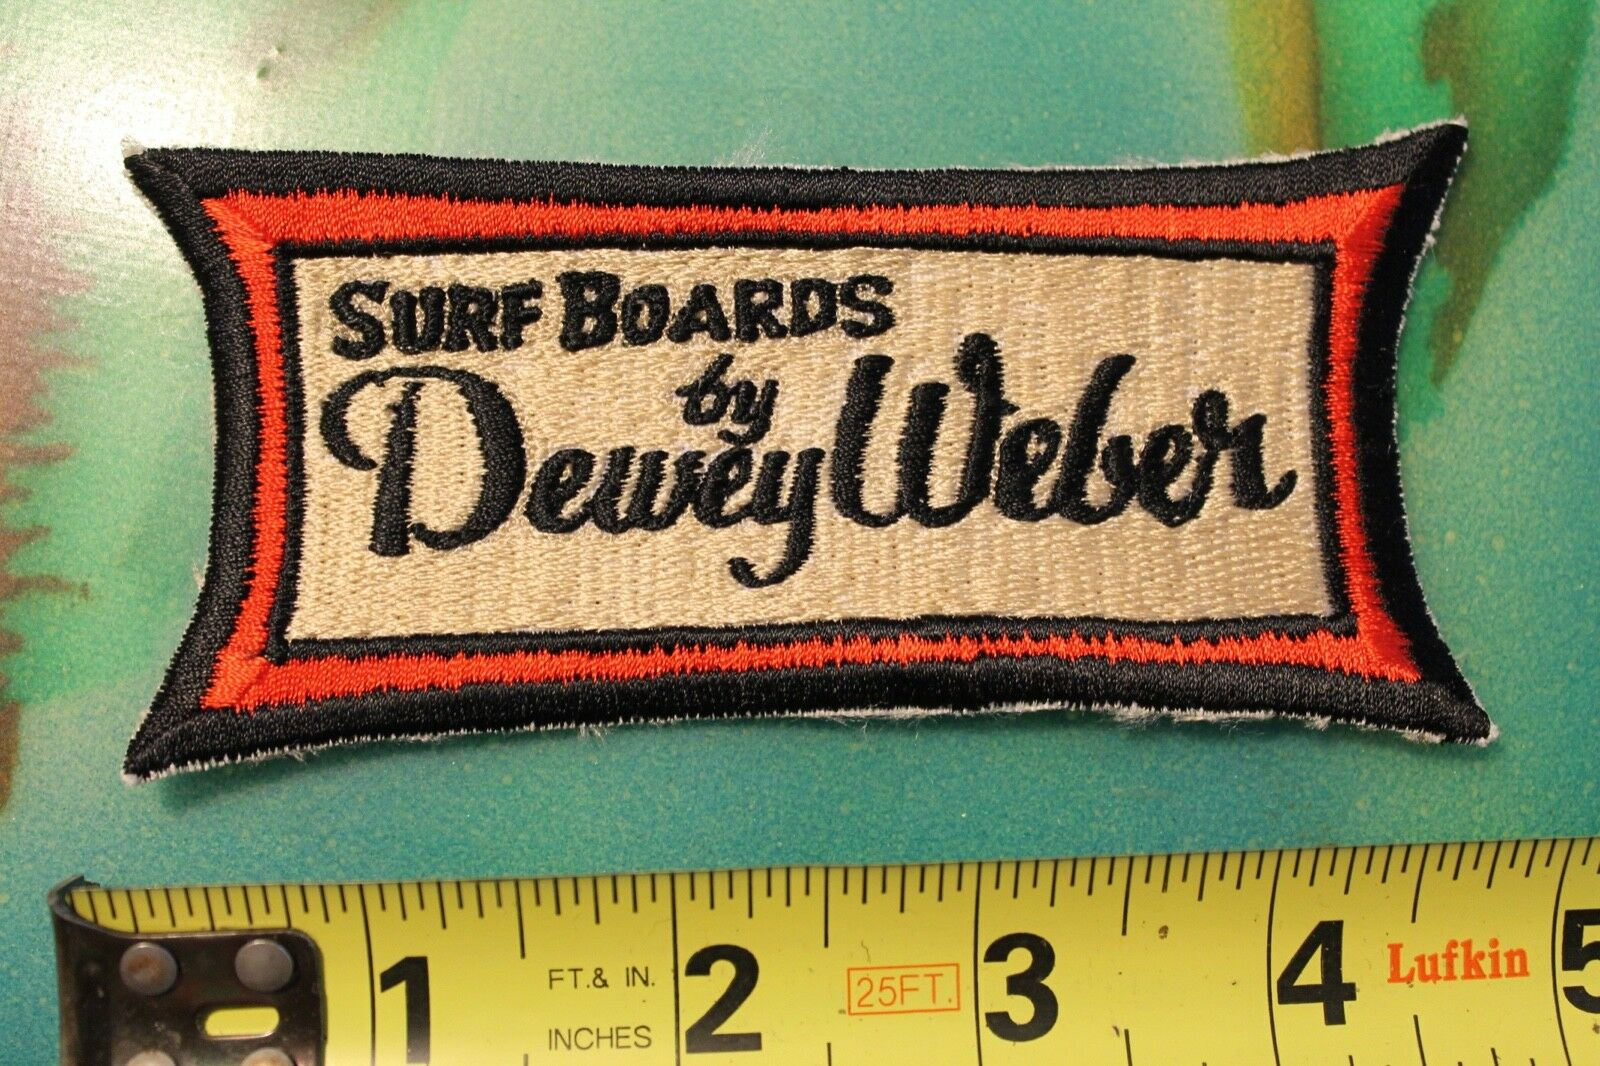 Dewey Weber Surfboards Surf Boards Classic Original Vintage 1960's Surfing PATCH